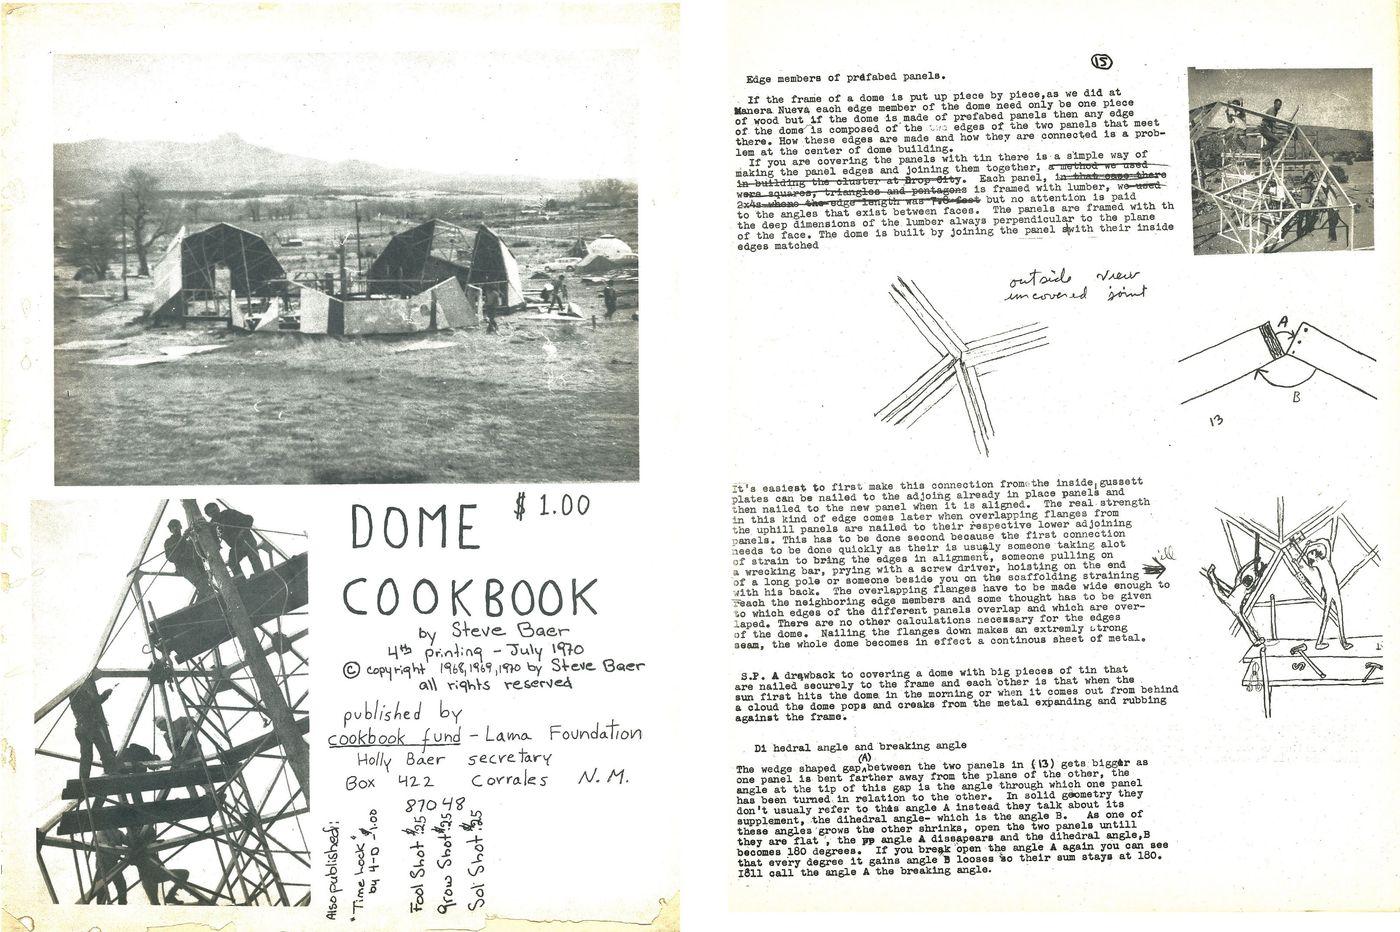 Dome_Cookbook_Cover_pg15.0